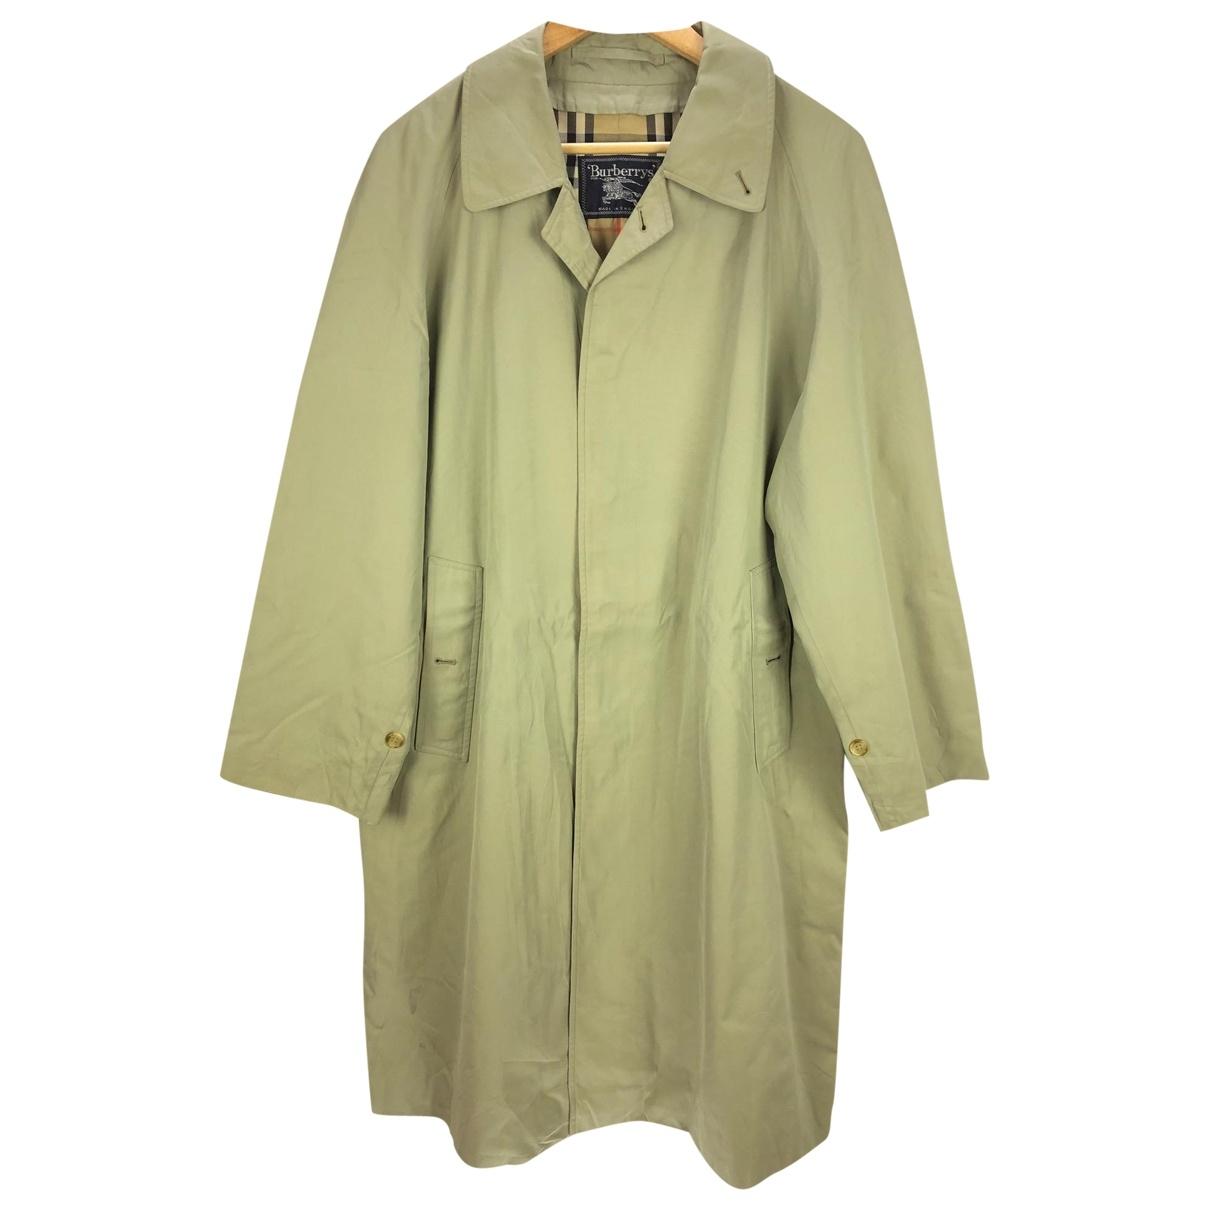 Burberry \N Khaki Cotton coat  for Men L International